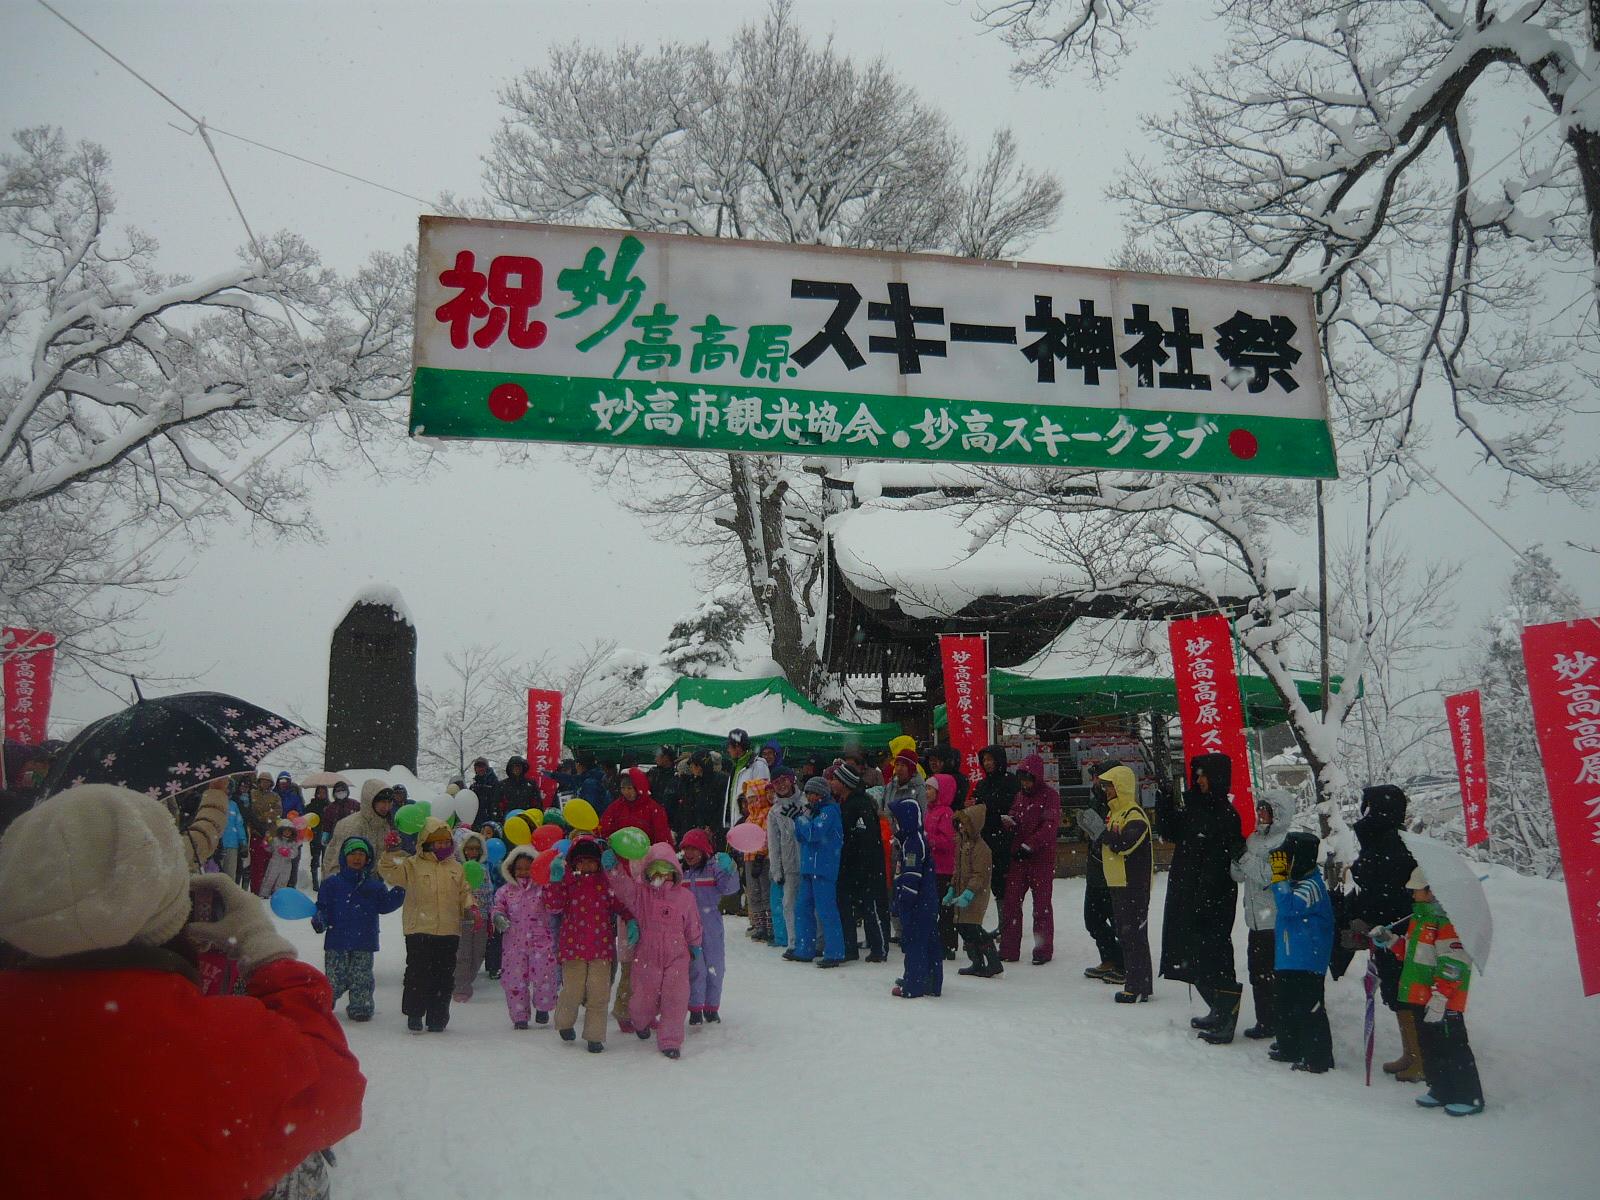 myoko-ski-season-opening-ceremony-2013 myoko snow report